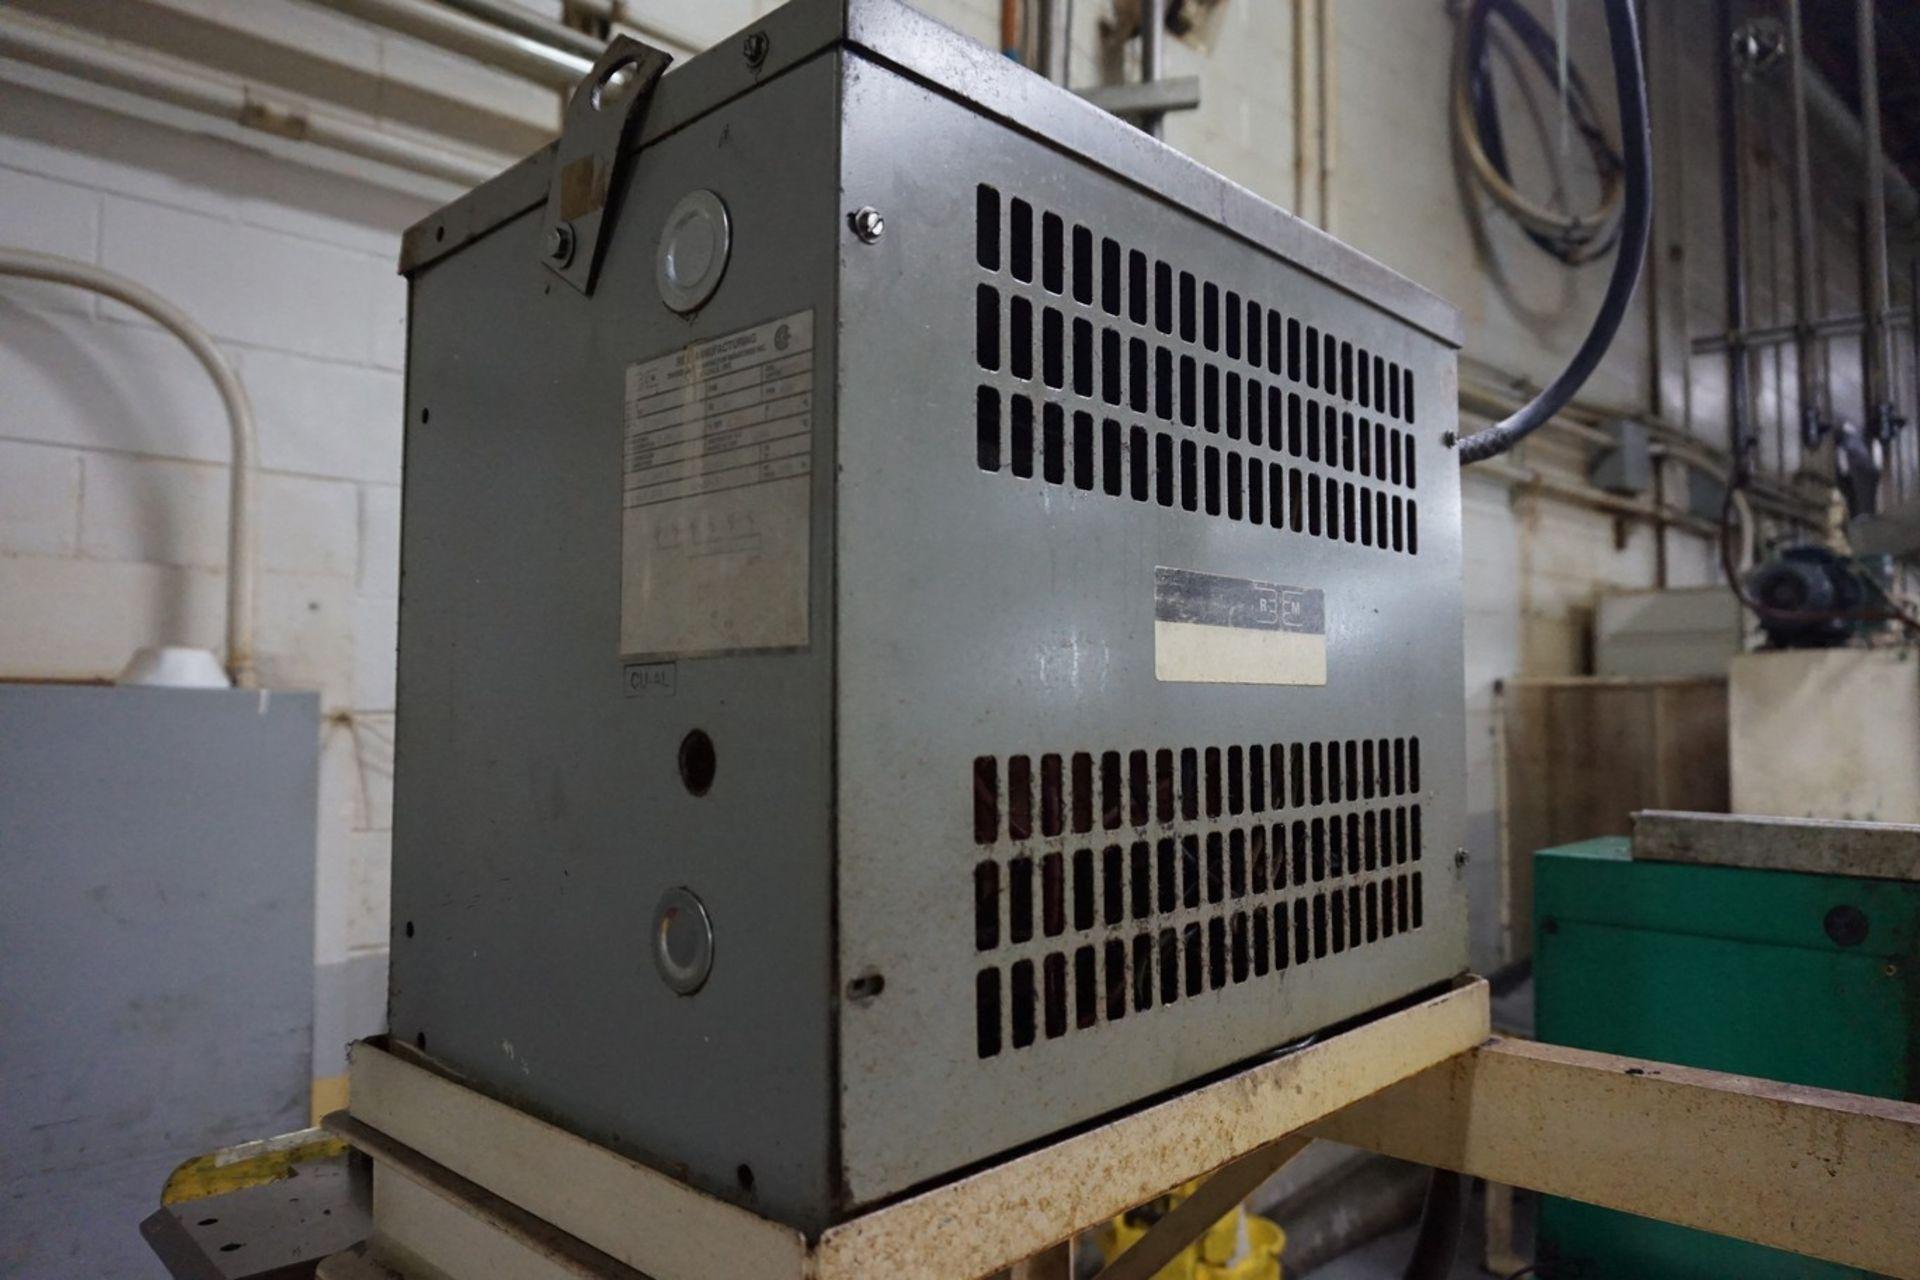 Takamatsu Model X10 CNC Lathe 200/220V c/w Chip Conveyor, Transformer - Image 6 of 6